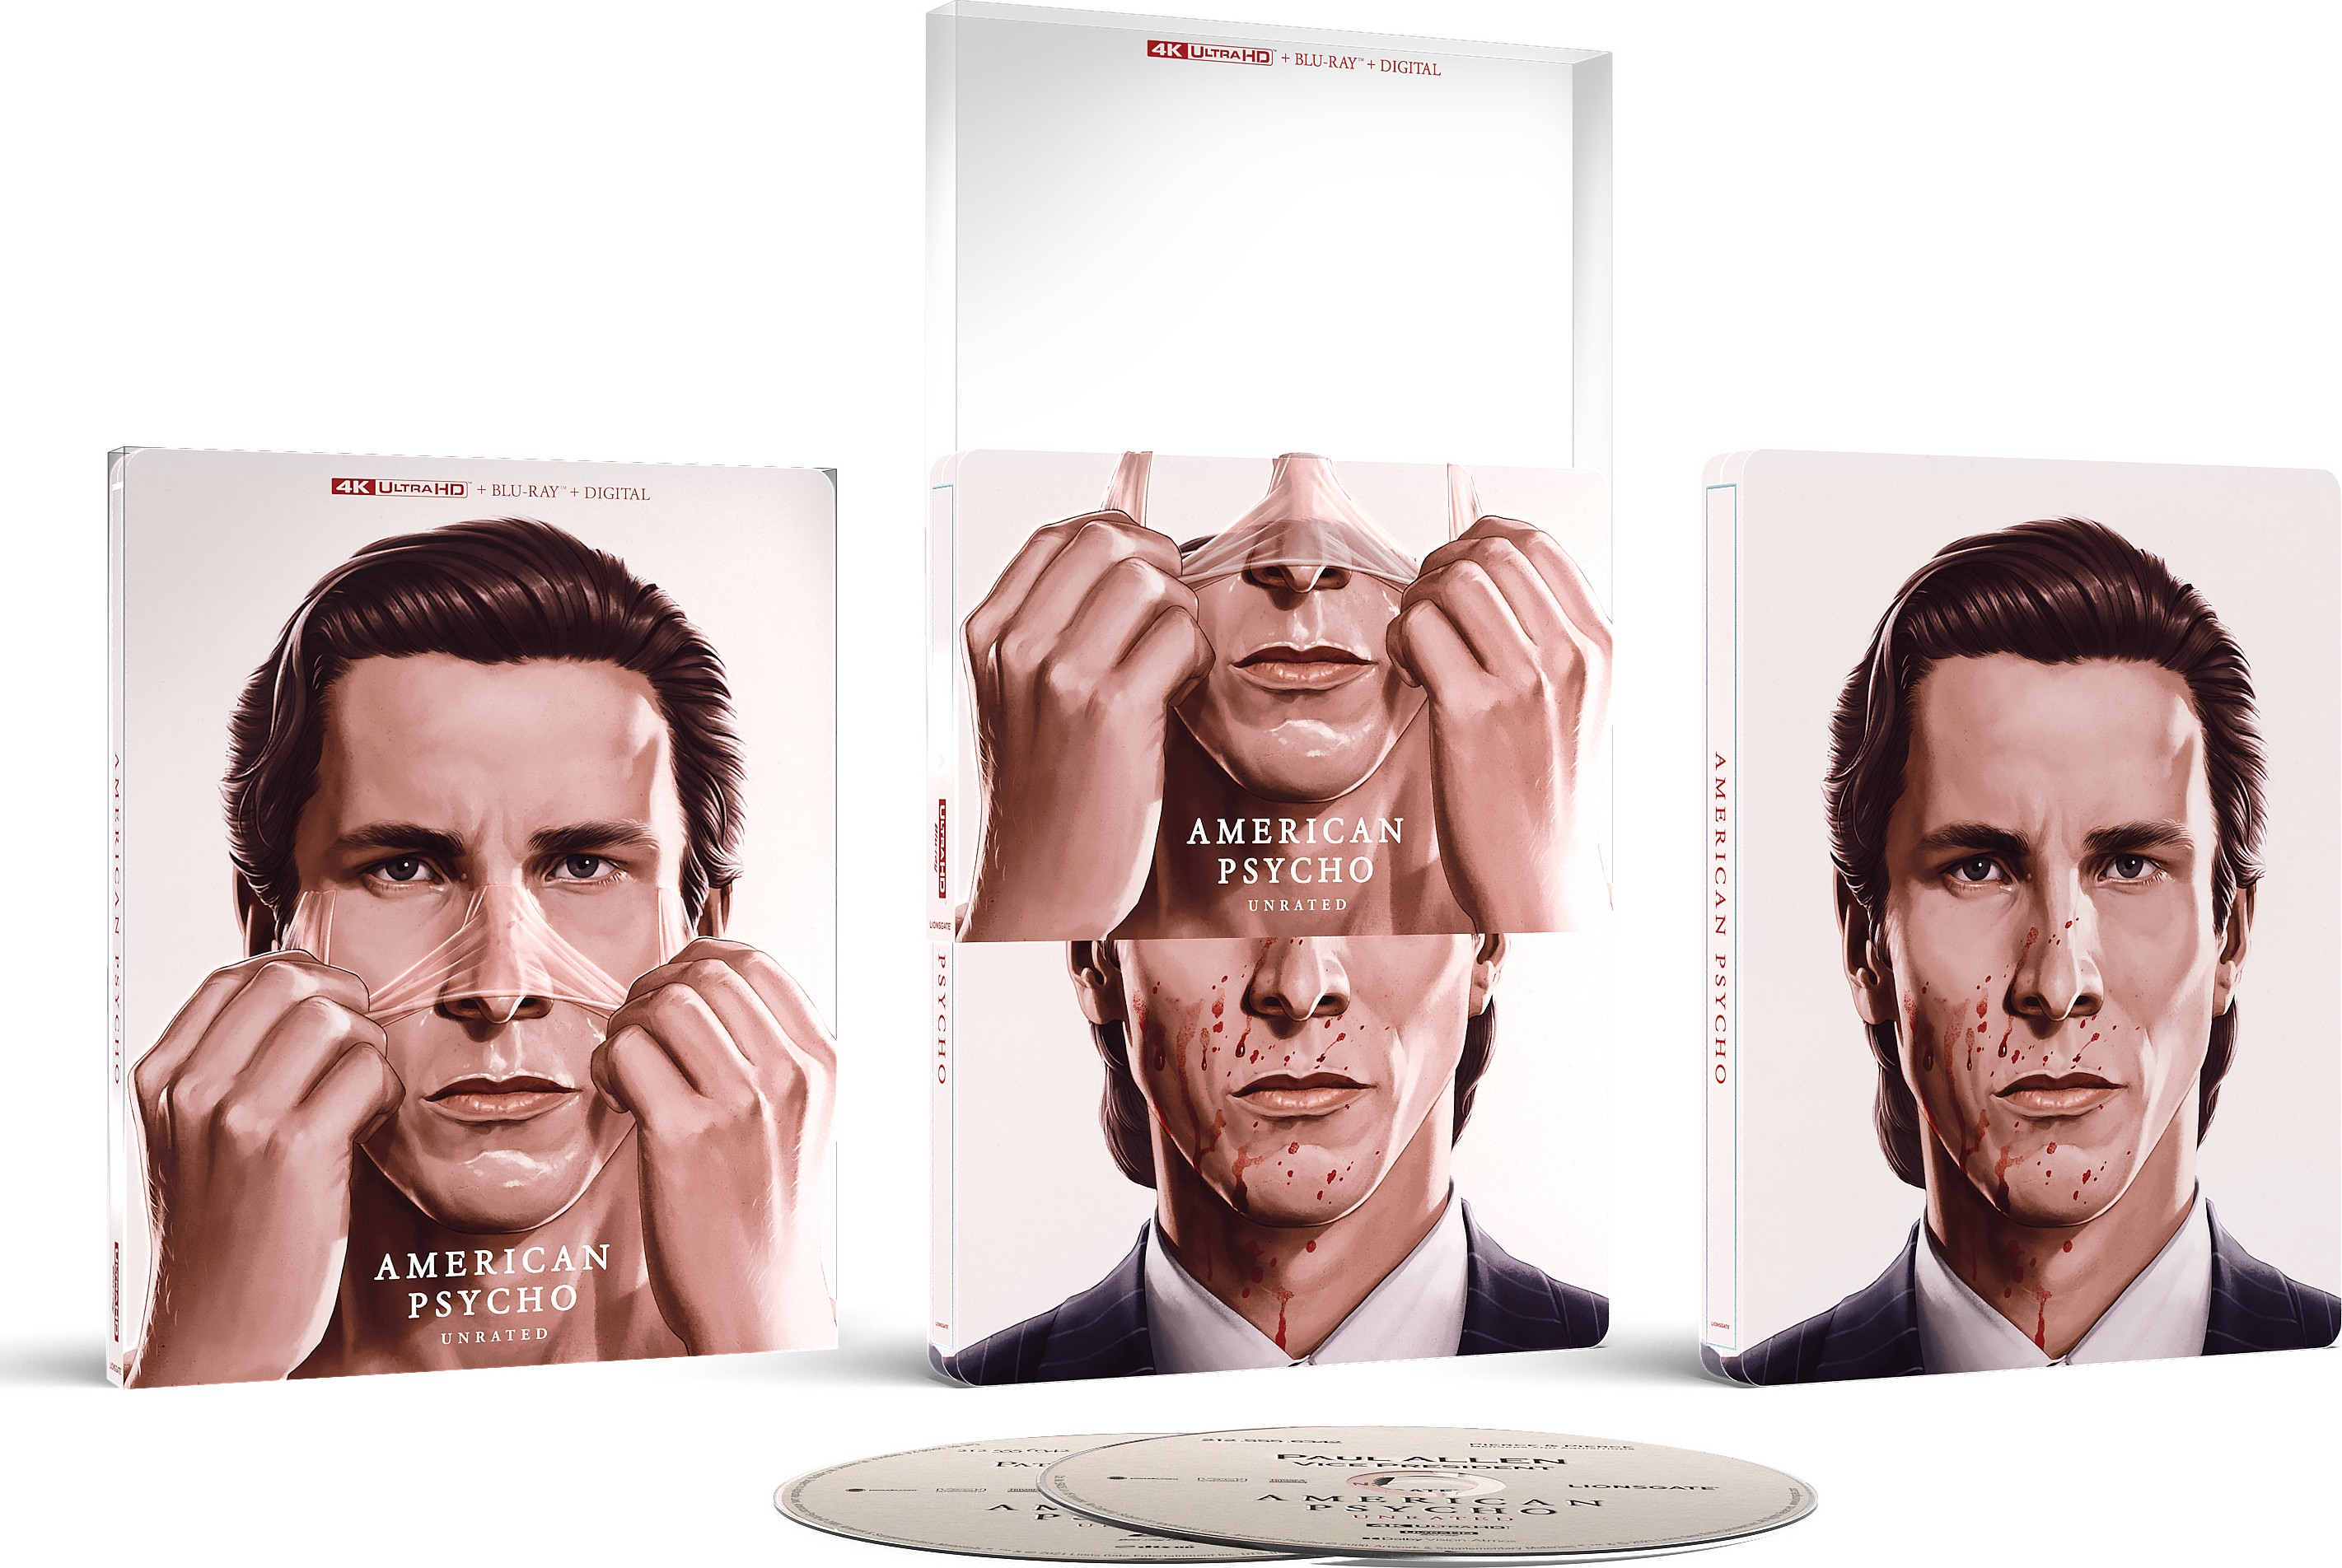 American Psycho steelbook 4K UHD